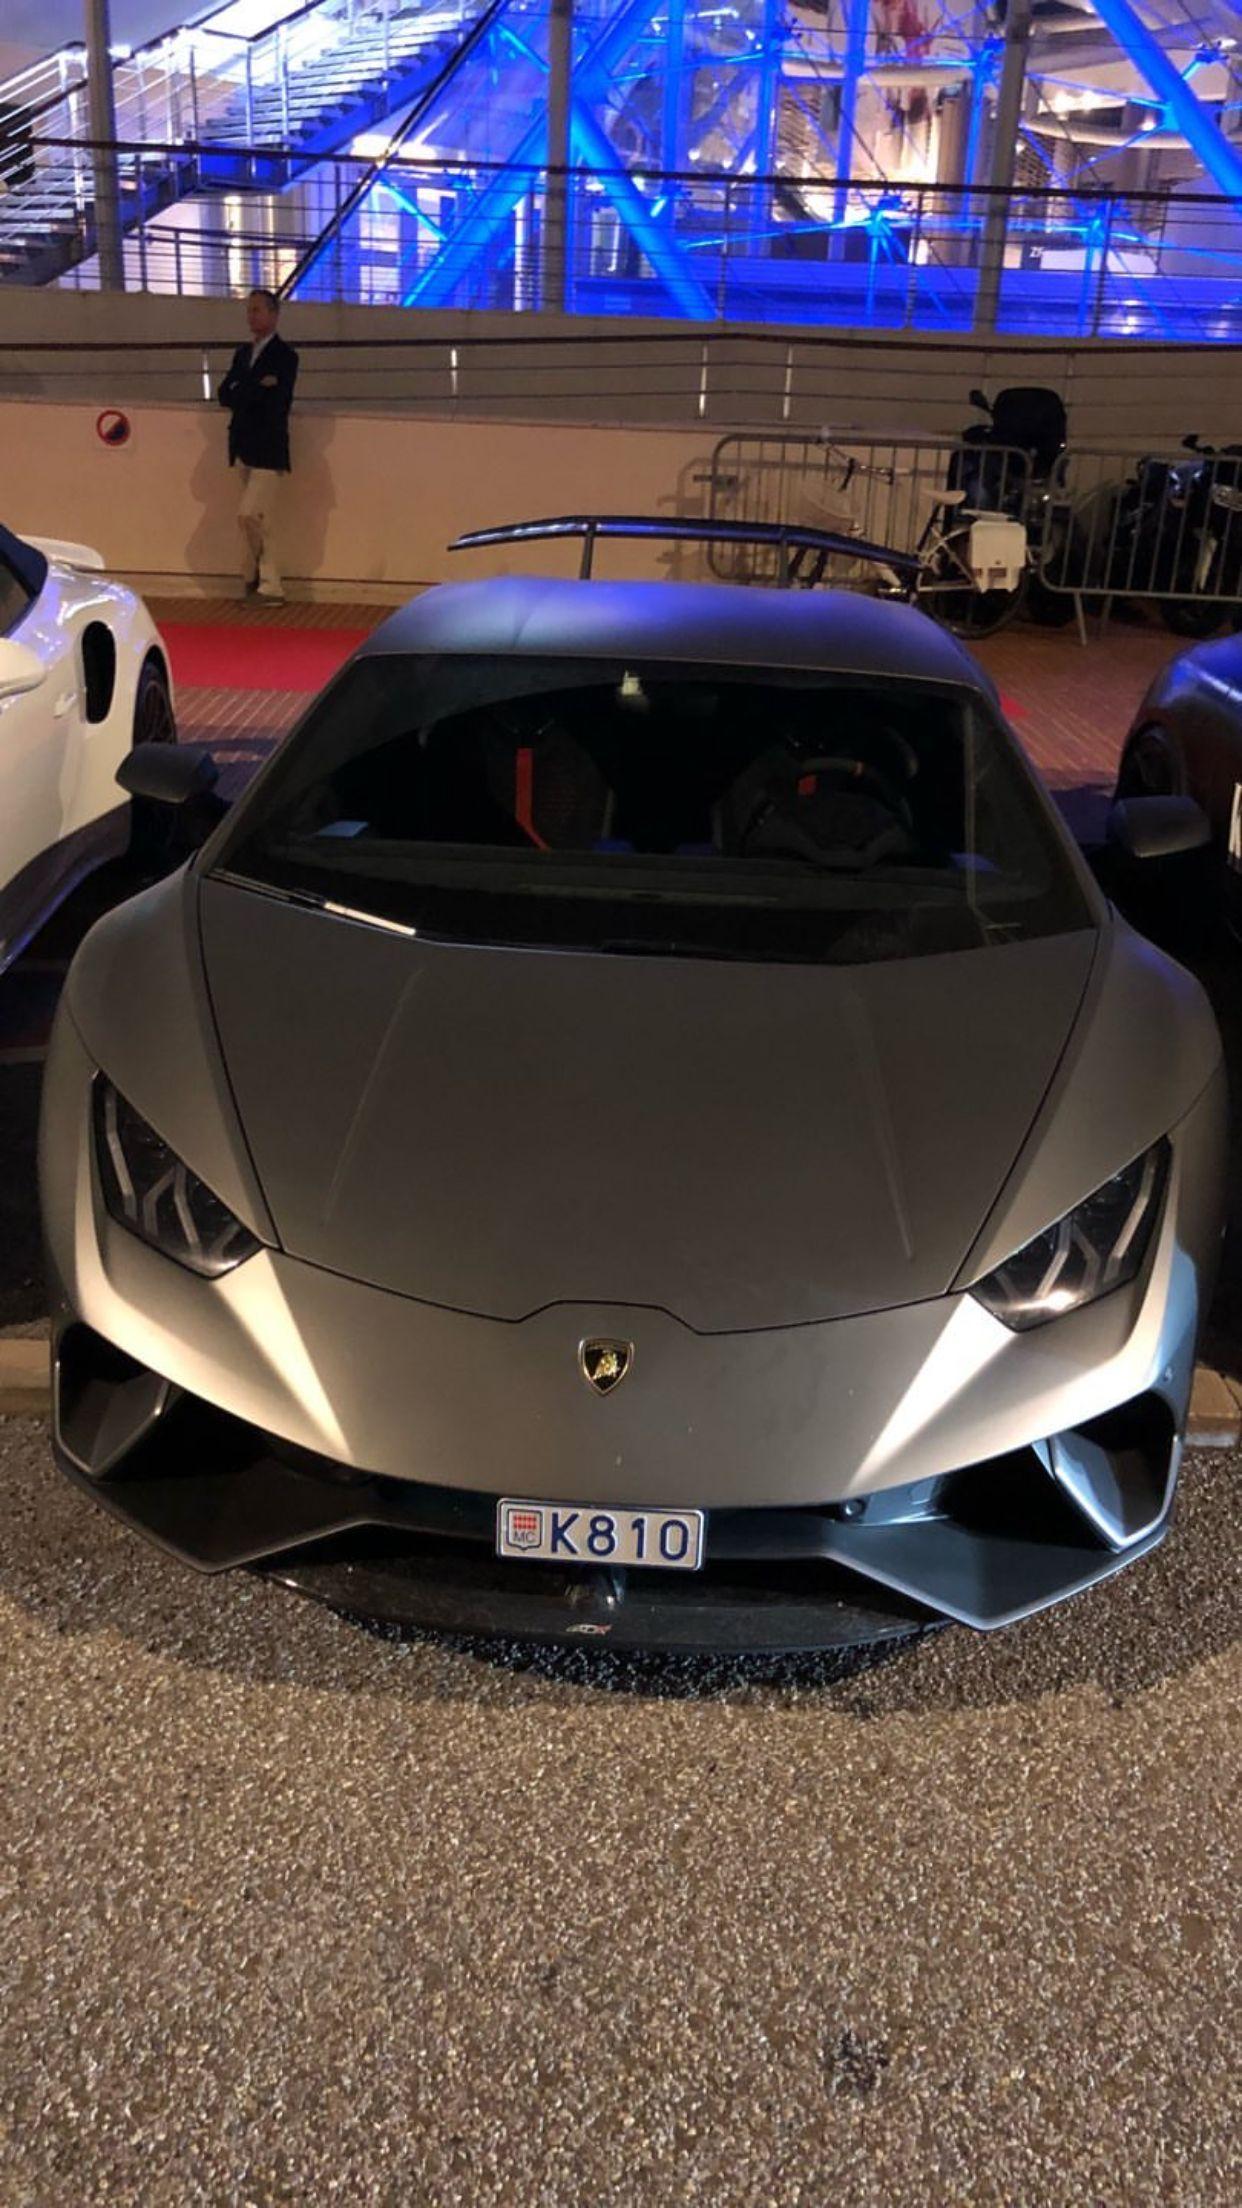 Lamborghini Huracan Supercars Sportscars Luxurycars Cars Bam